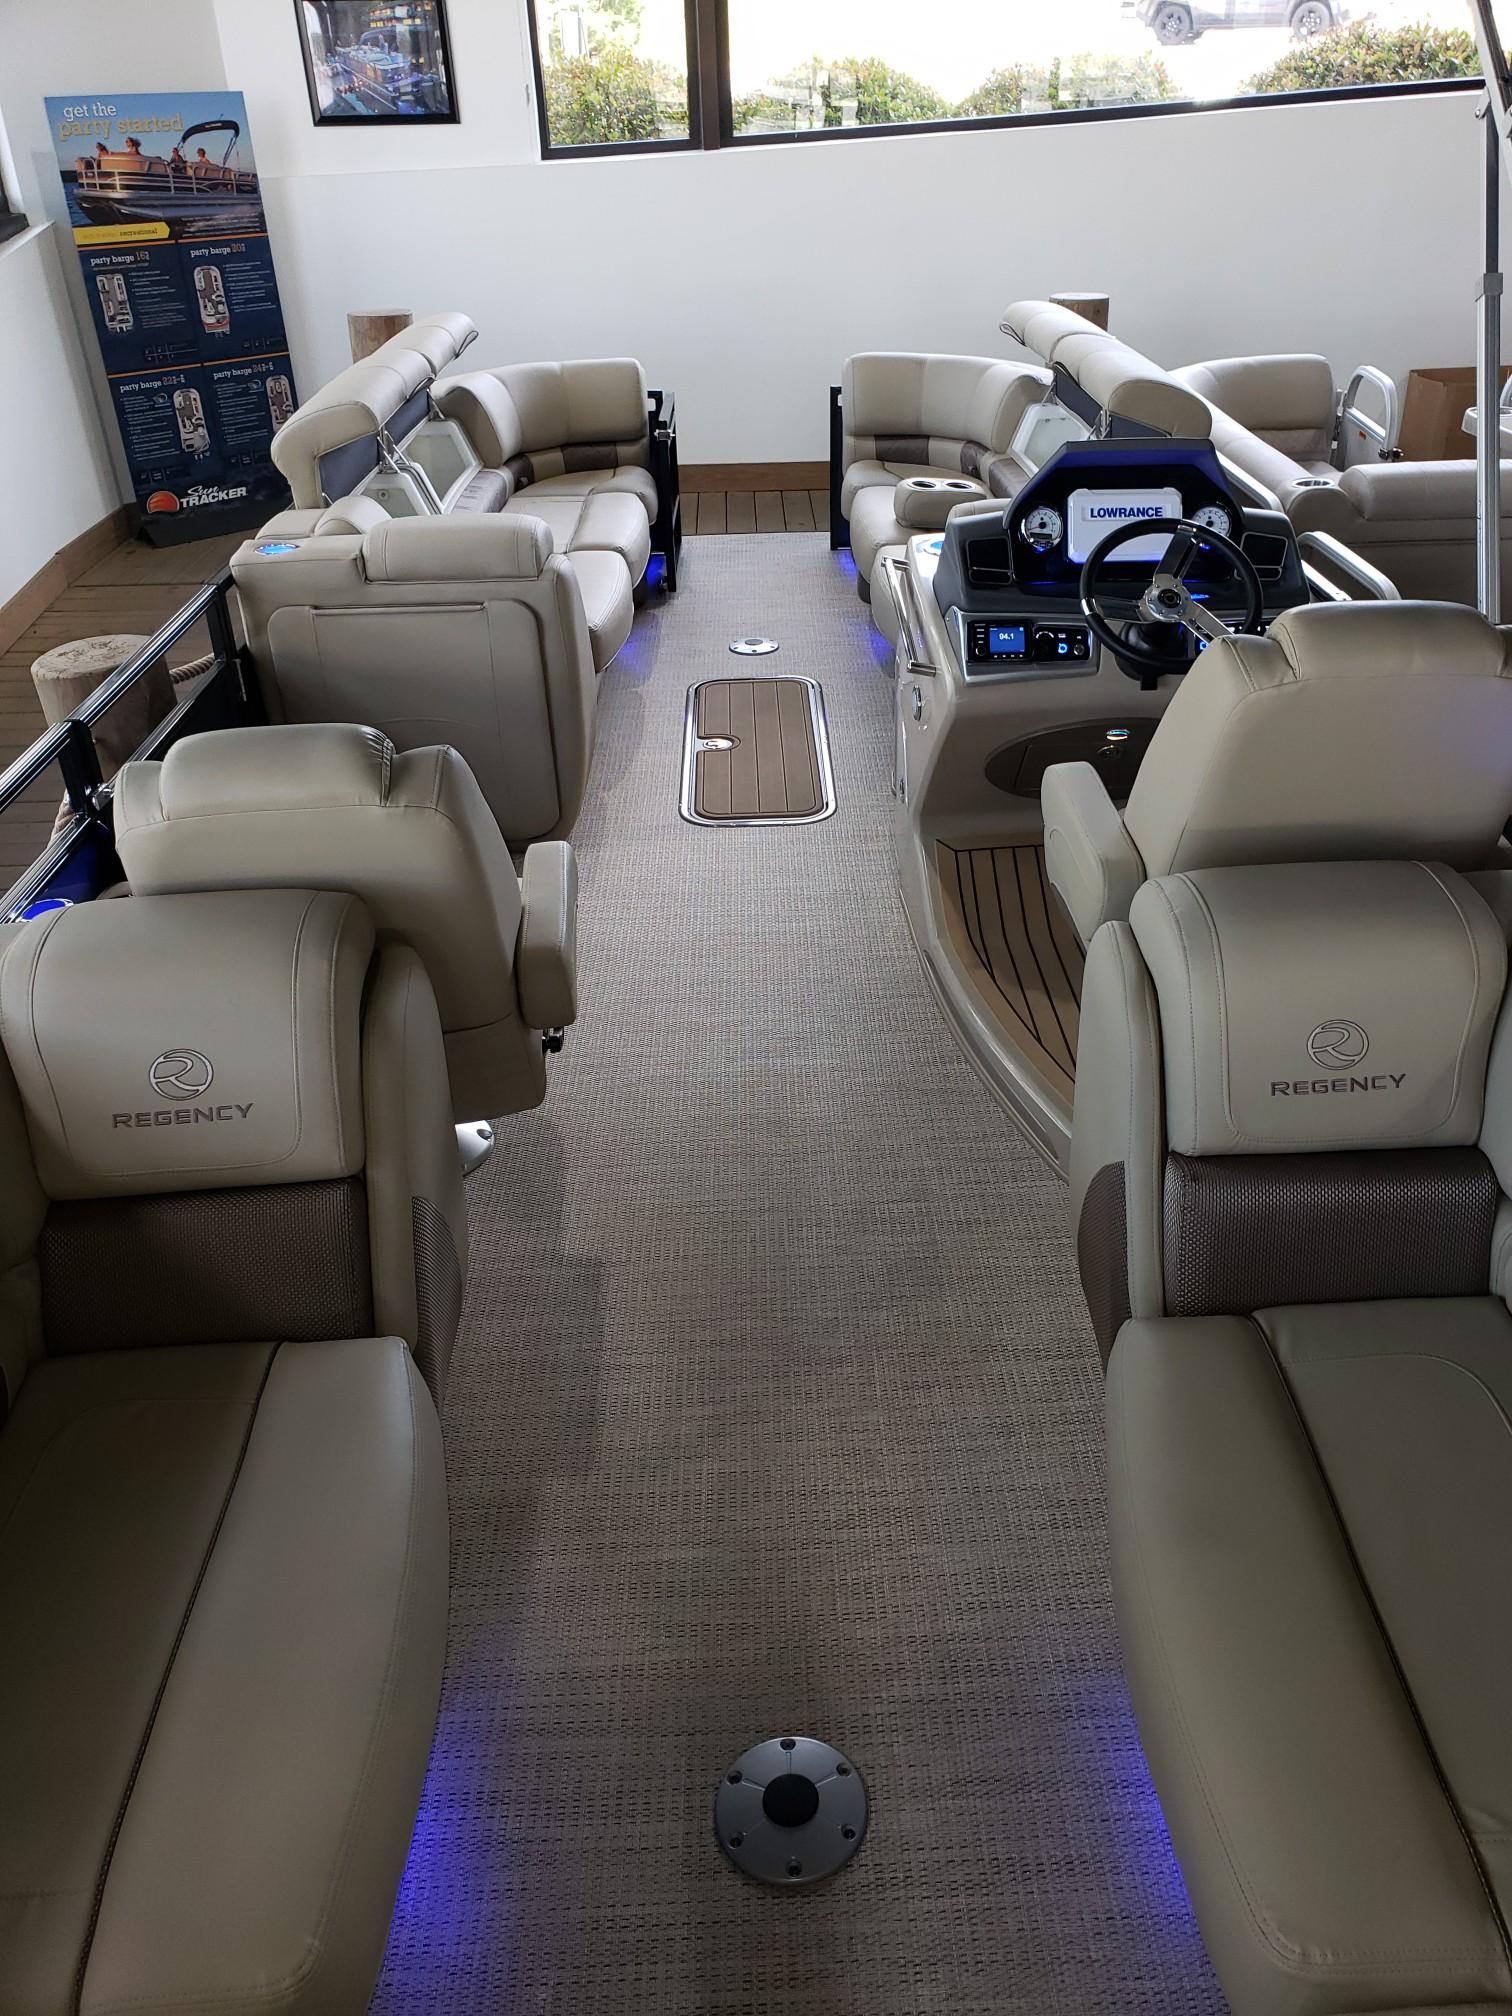 2020 Regency boat for sale, model of the boat is 250 LE3 w/300L Verado & Image # 17 of 27